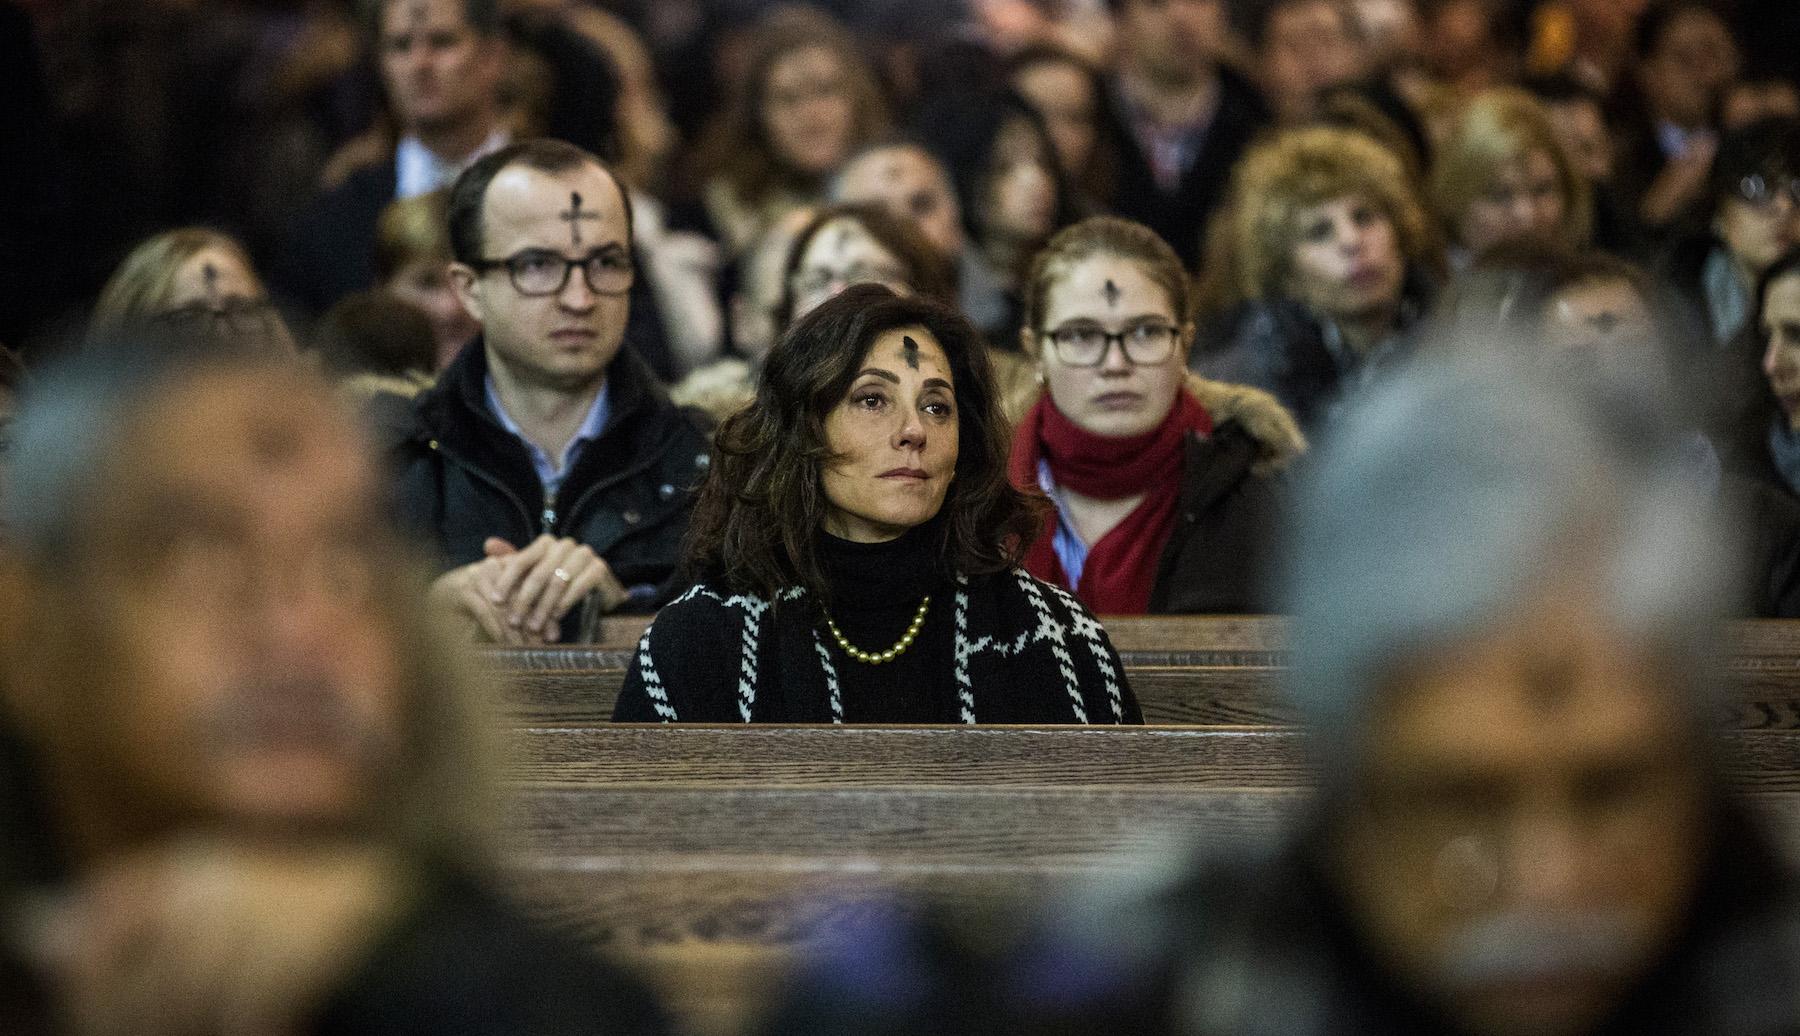 Foto Historia y simbolismo del Miércoles de Ceniza 18 febrero 2020